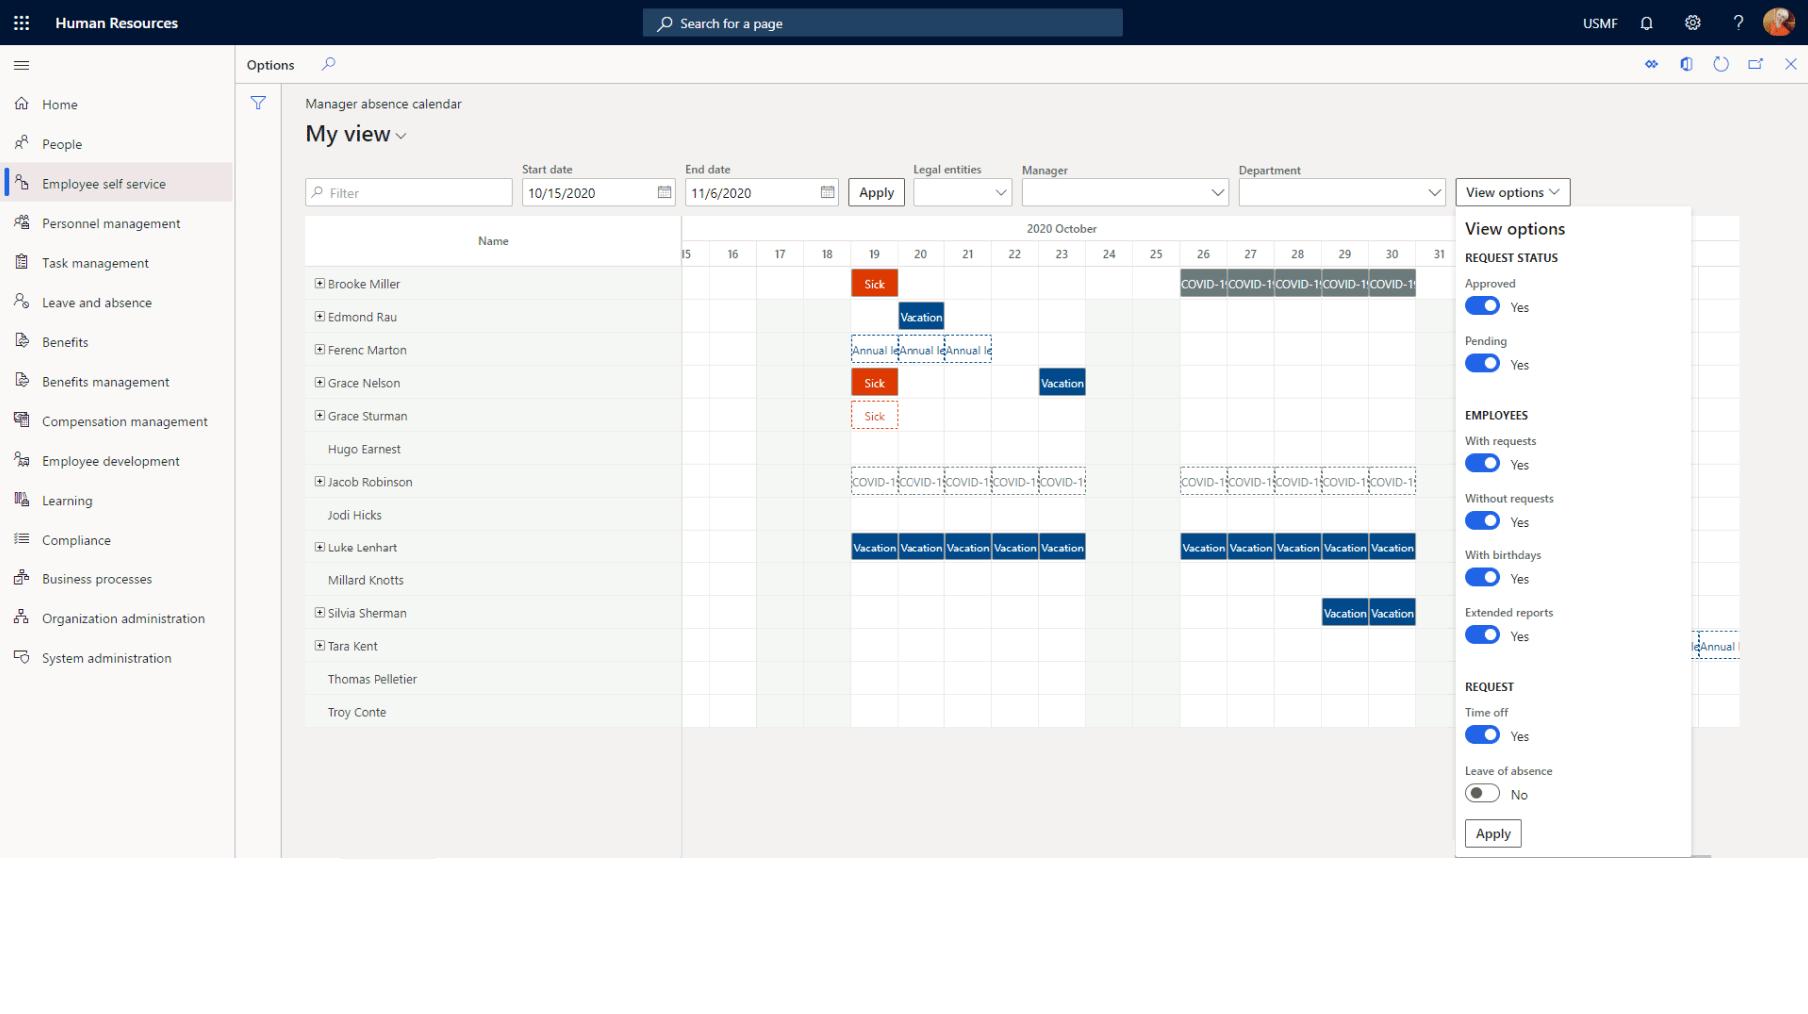 Microsoft Dynamics 365 Human Resources features: Optimize processes